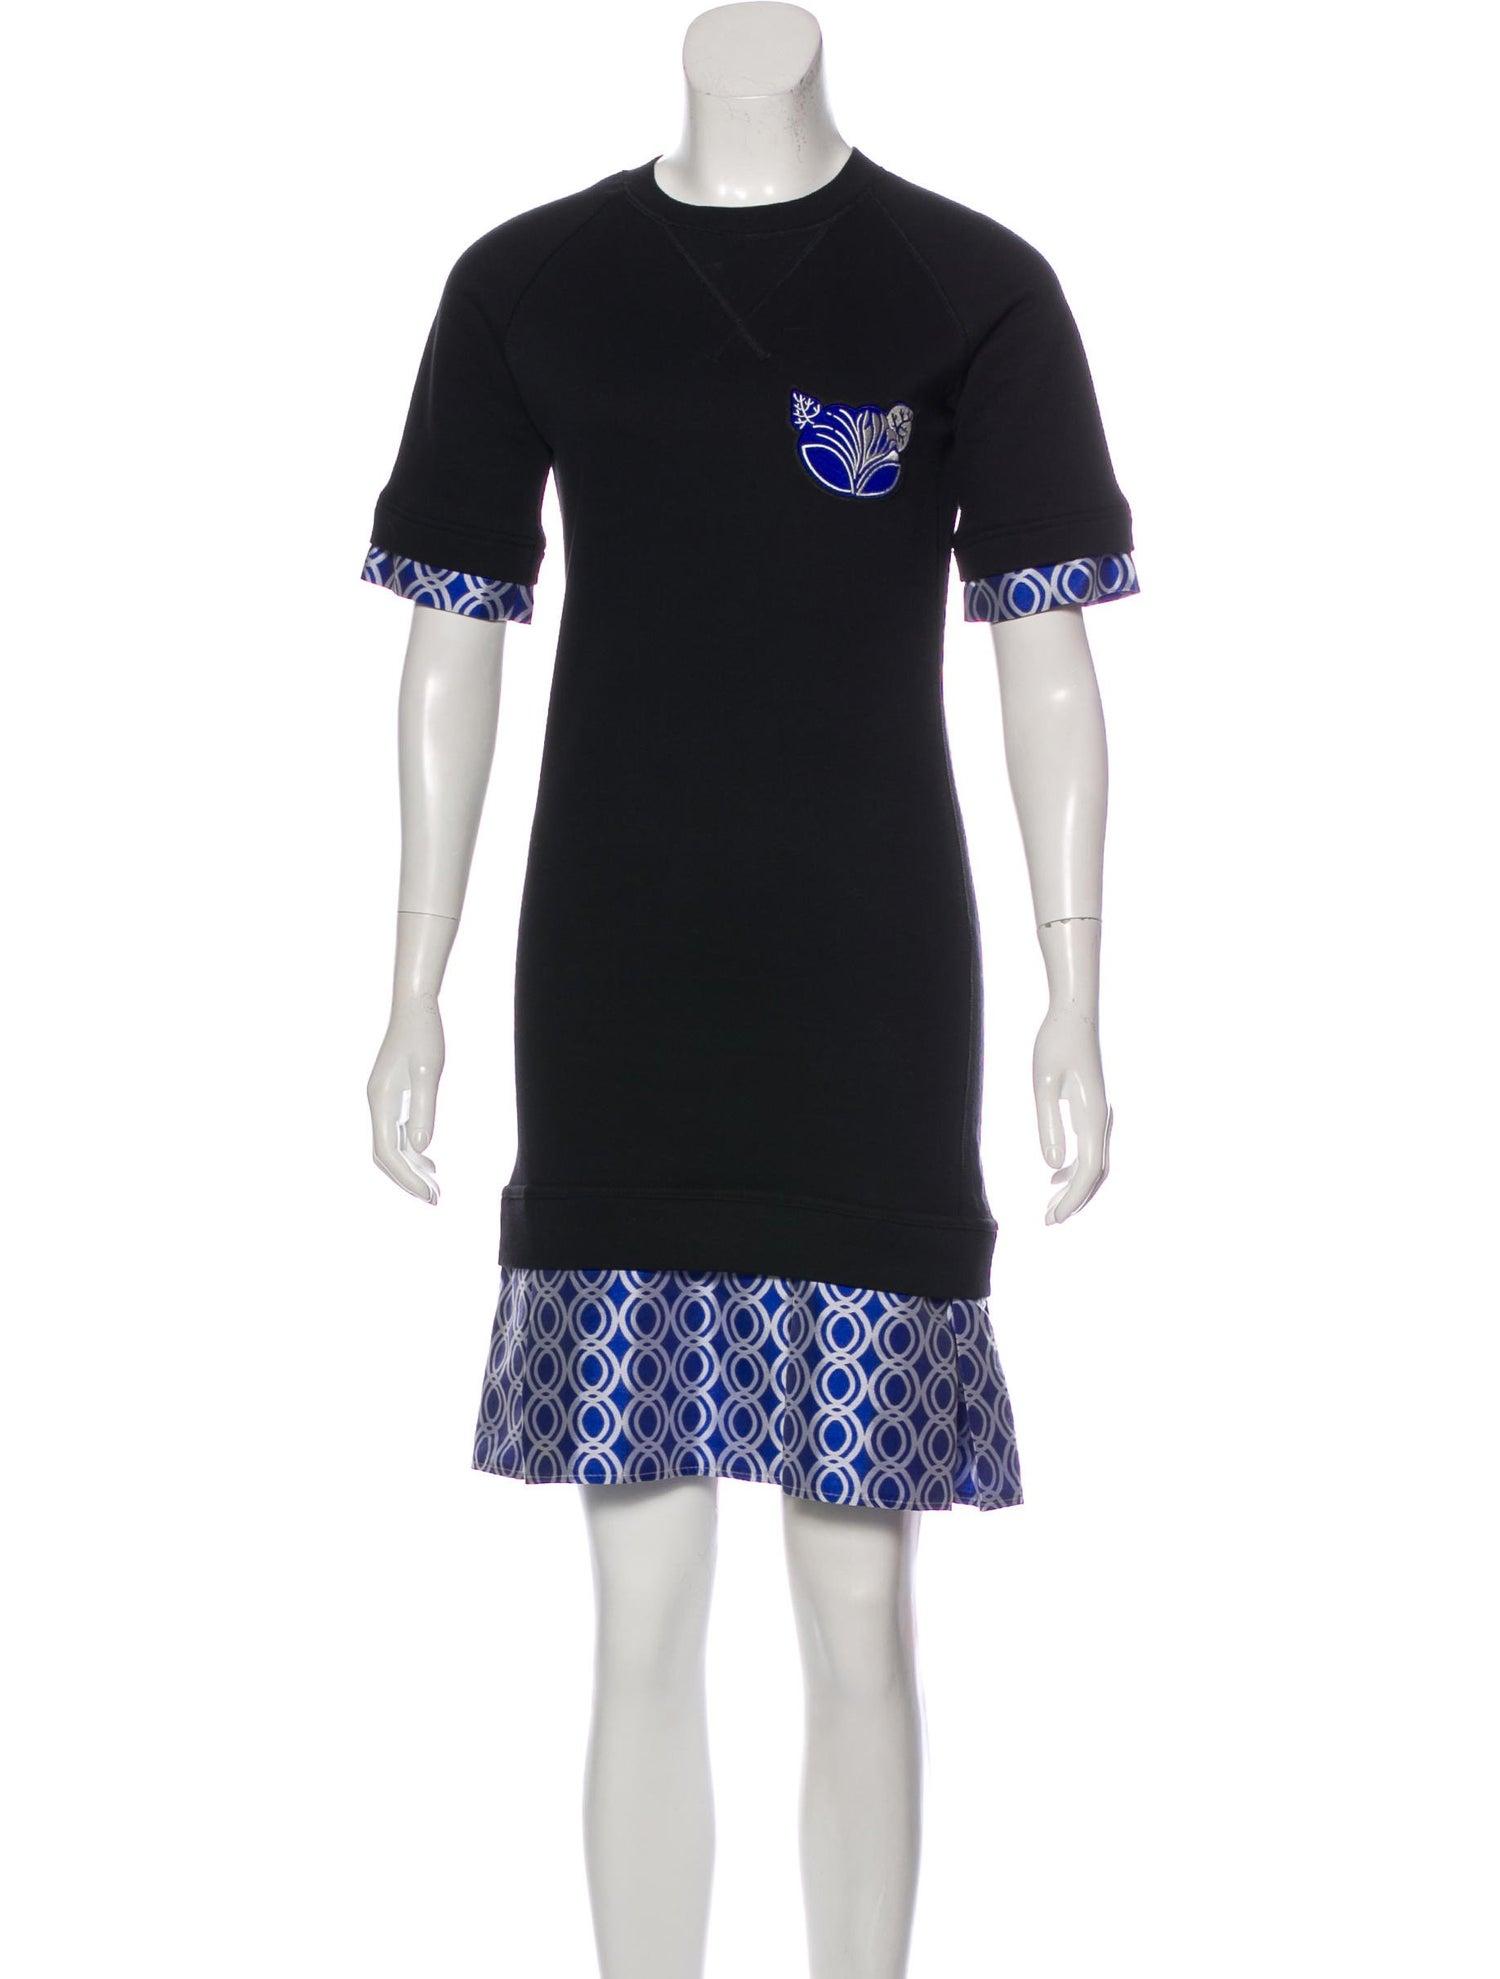 OSTWALD HELGASON Printed Knee-Length Dress, $52 @therealreal.com